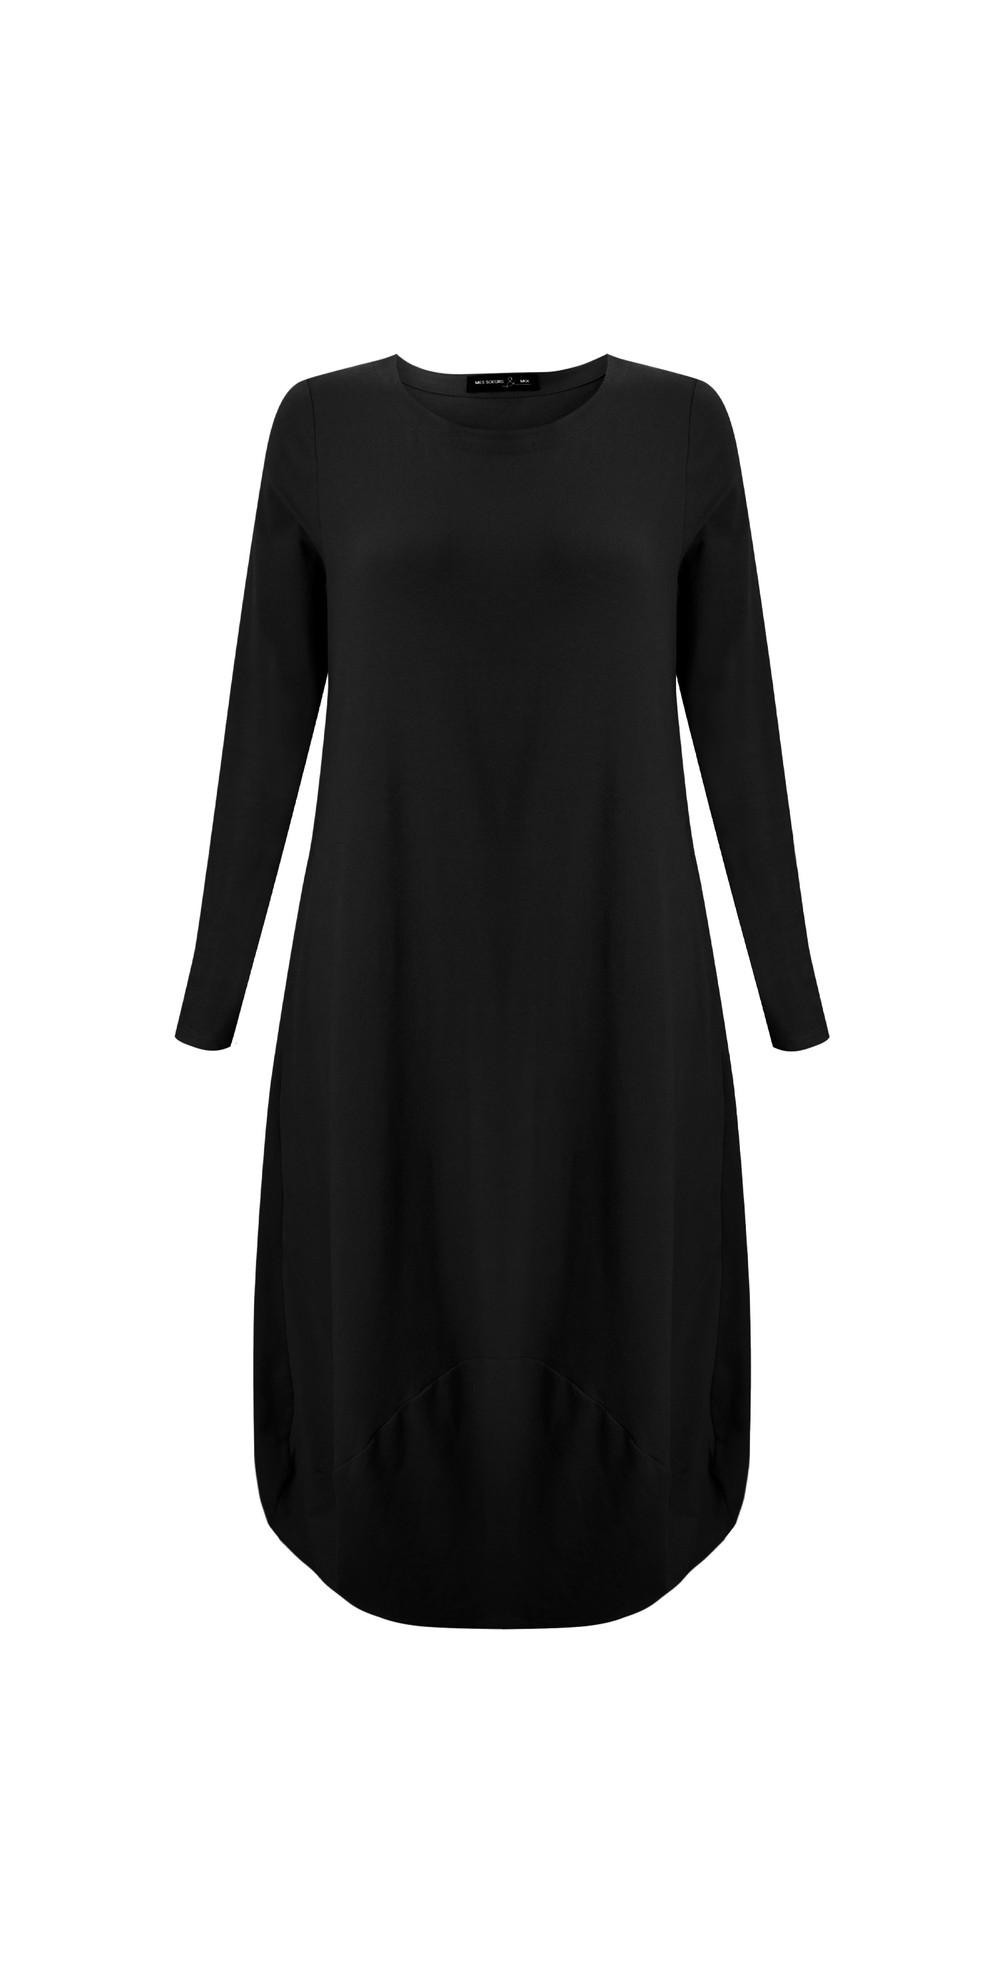 Faucon Comfort Dress main image